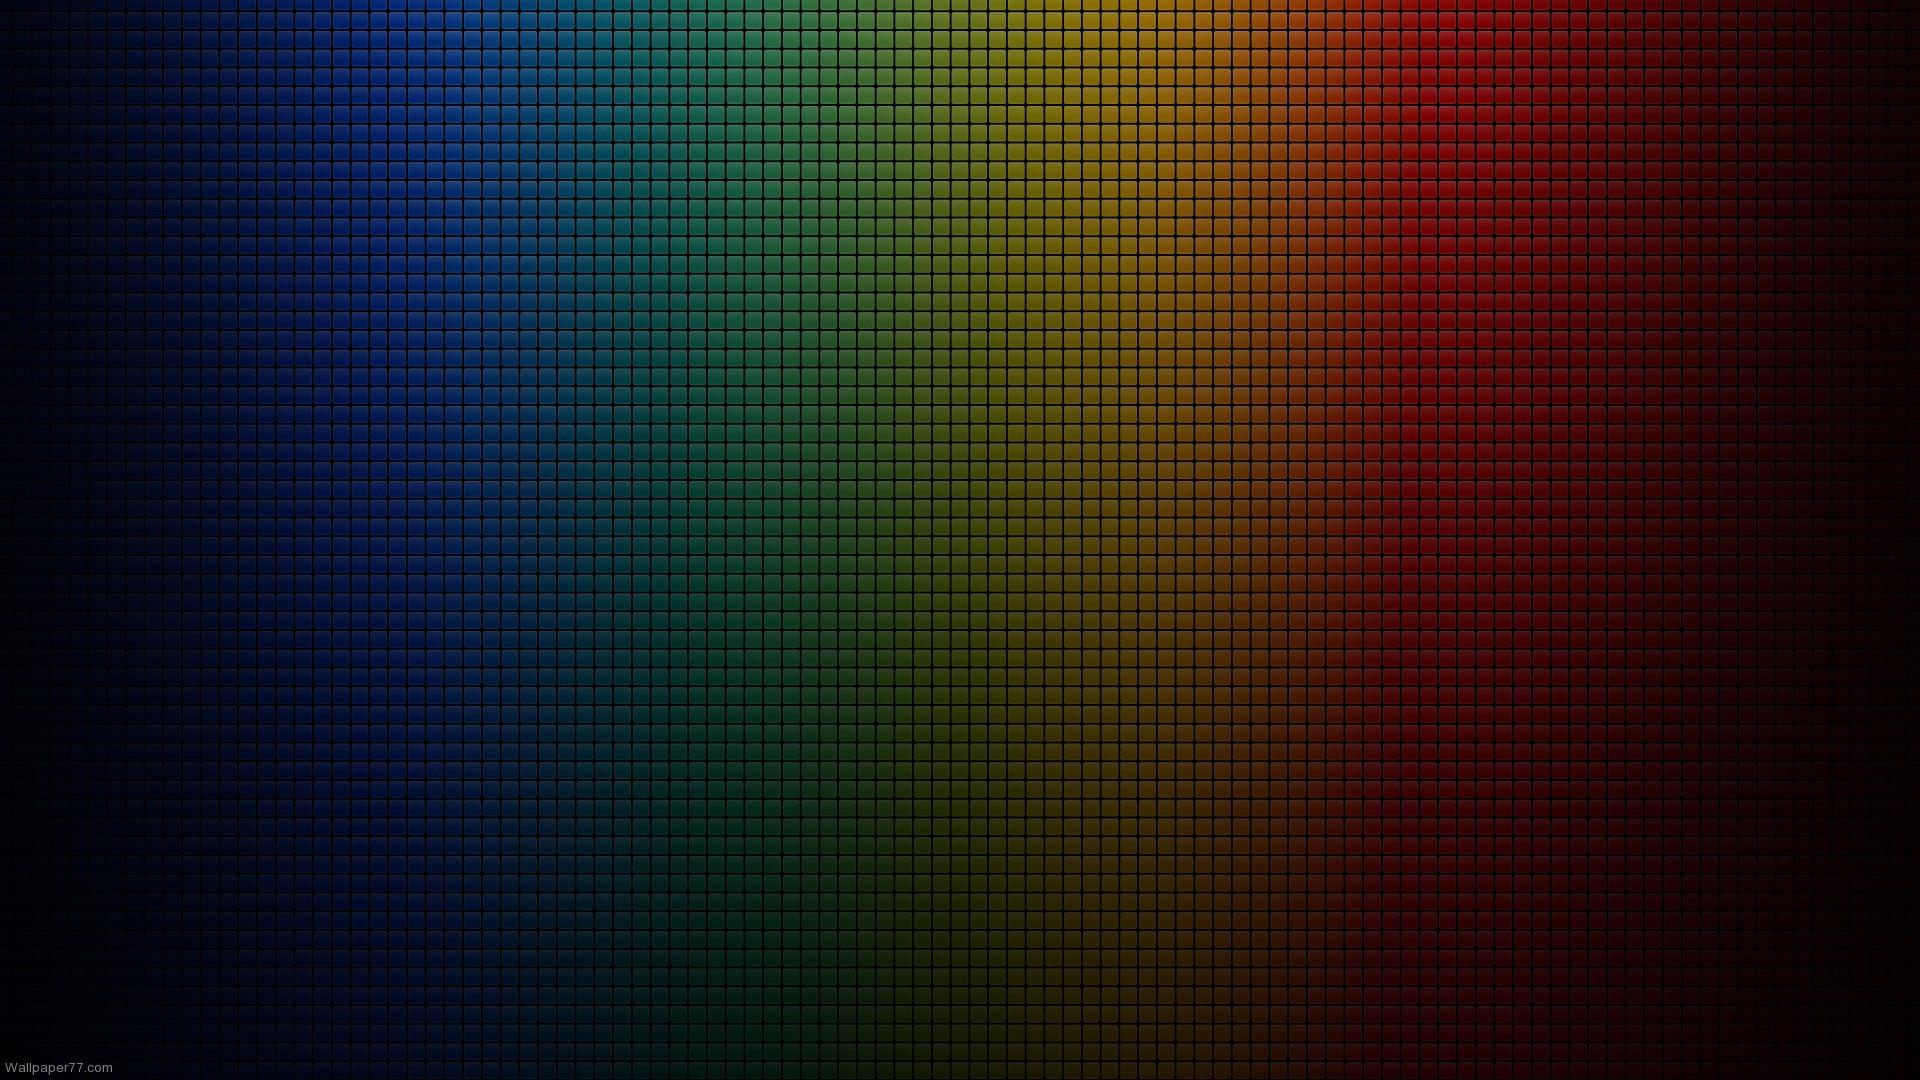 Ipad Retina Display Wallpapers: Best Retina Display Wallpaper (56+ Images